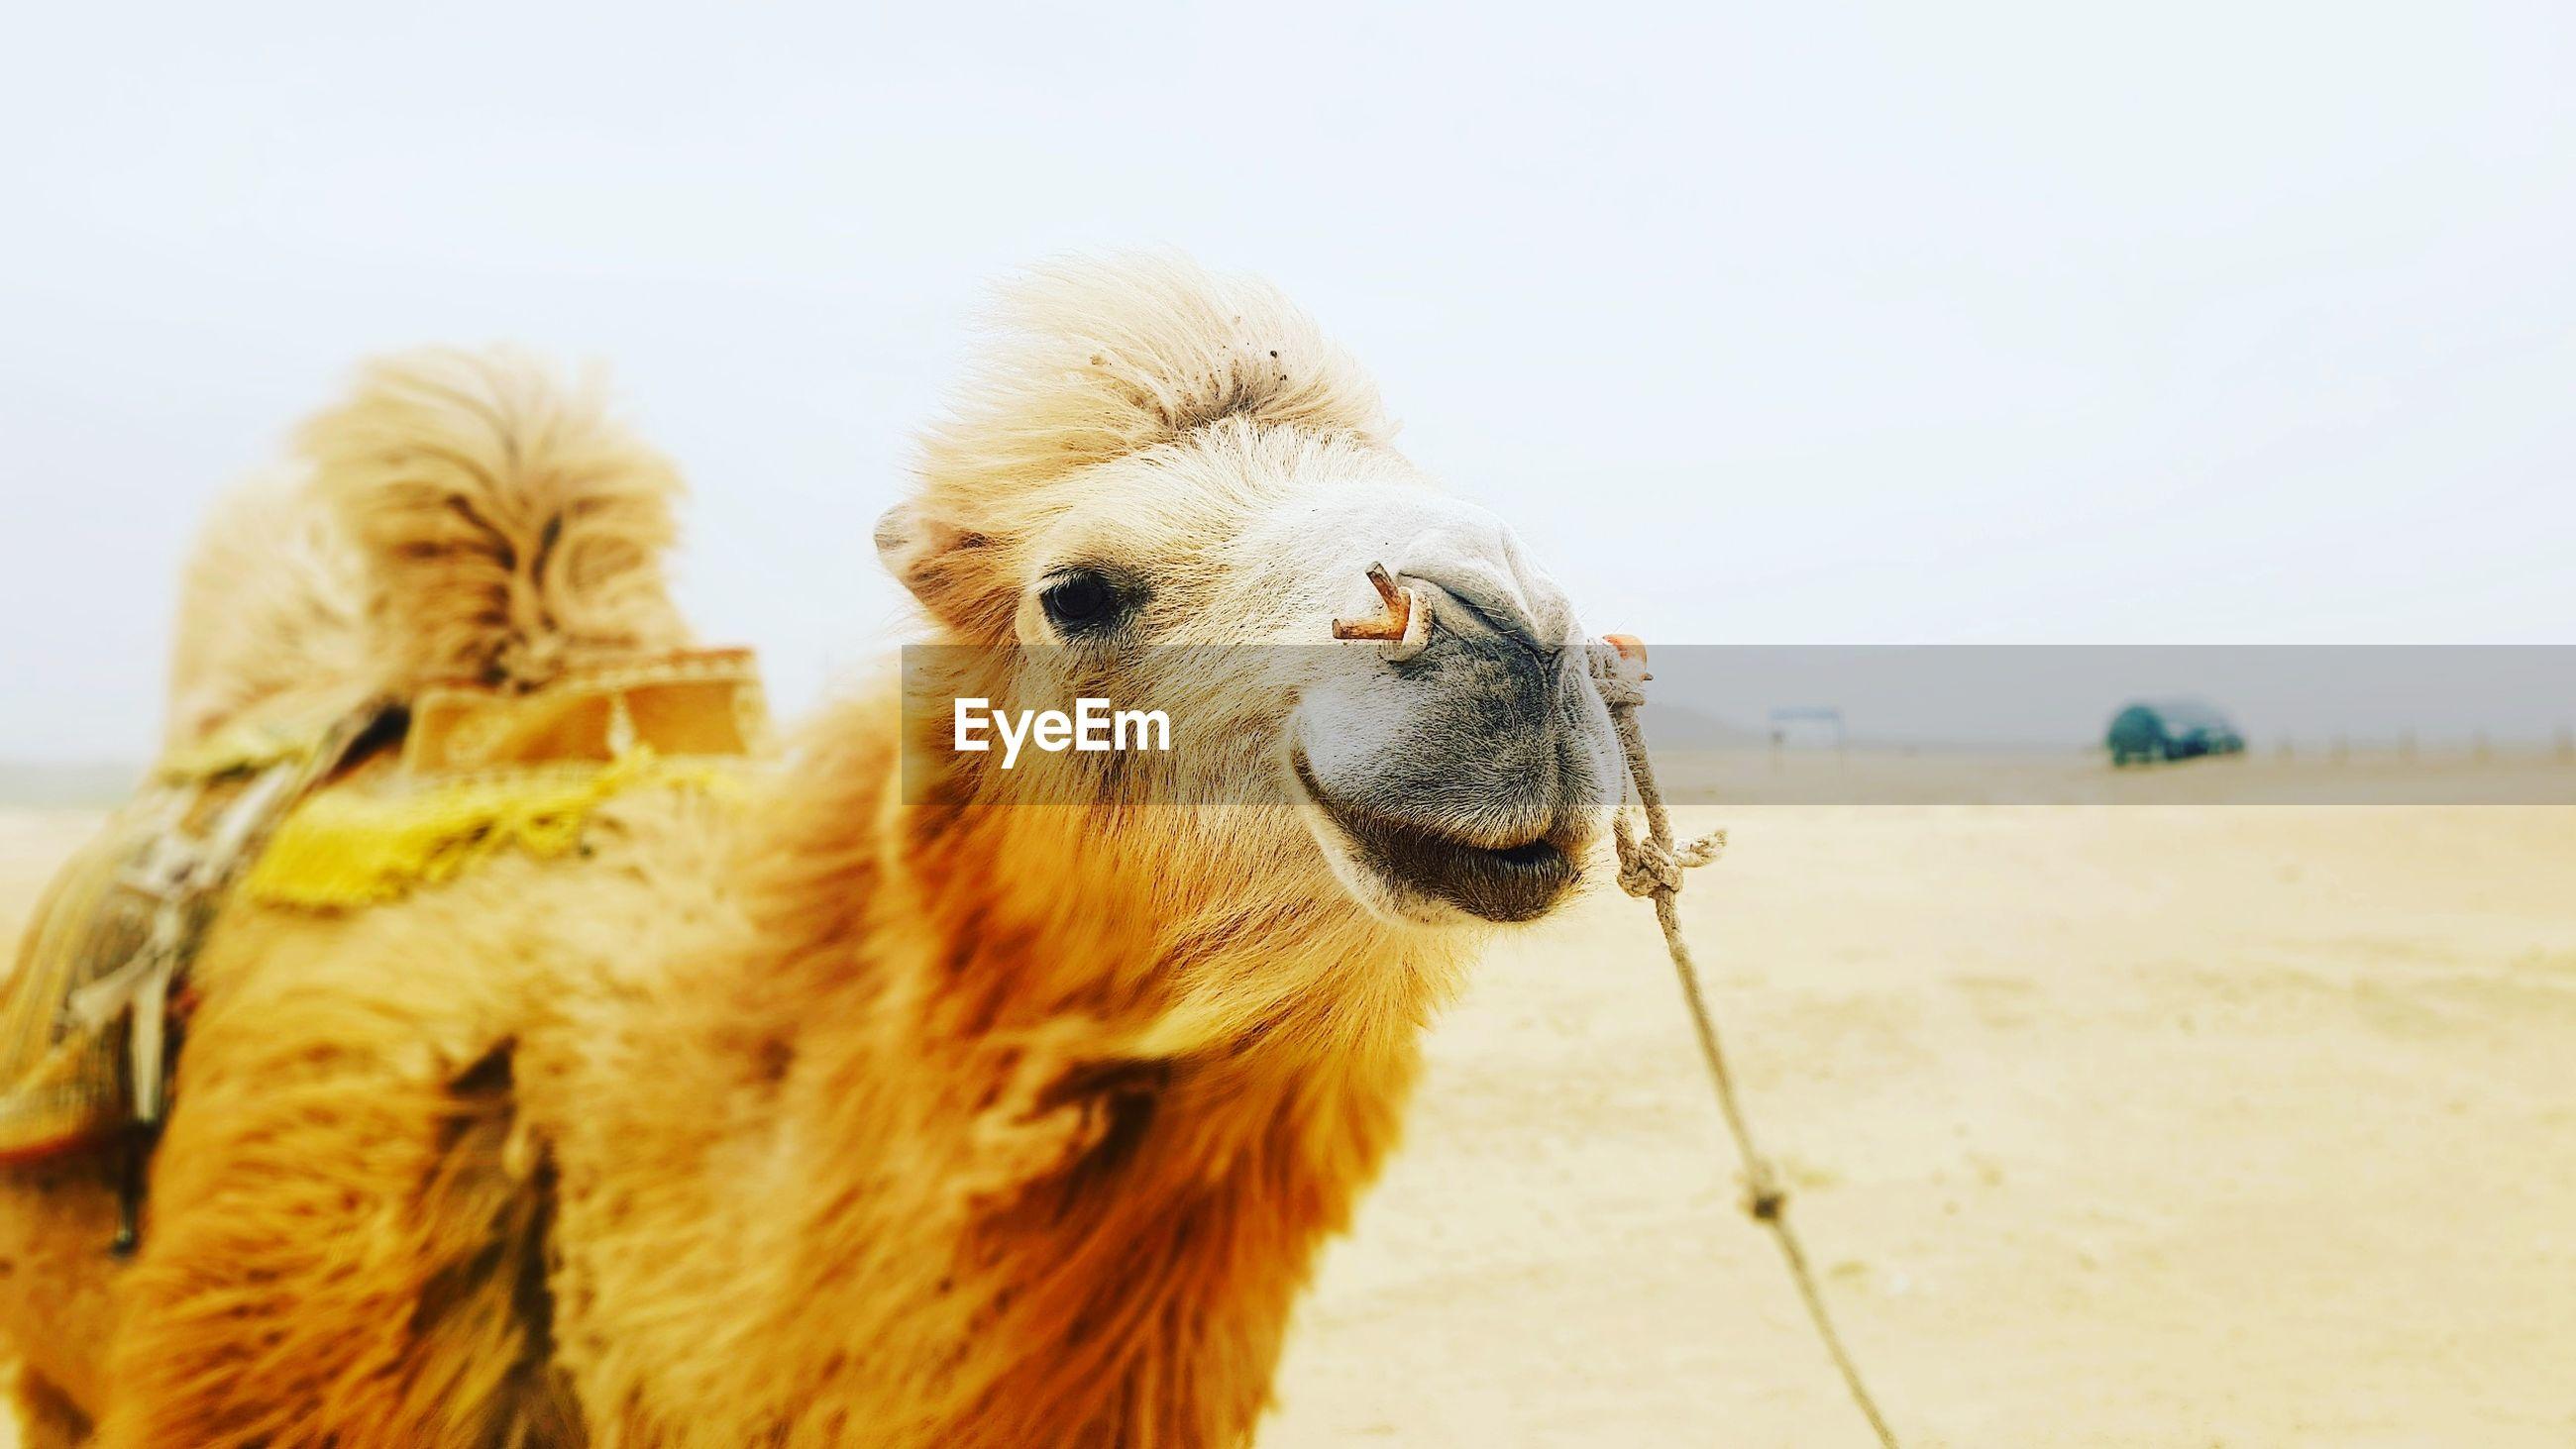 Close-up of camel at desert